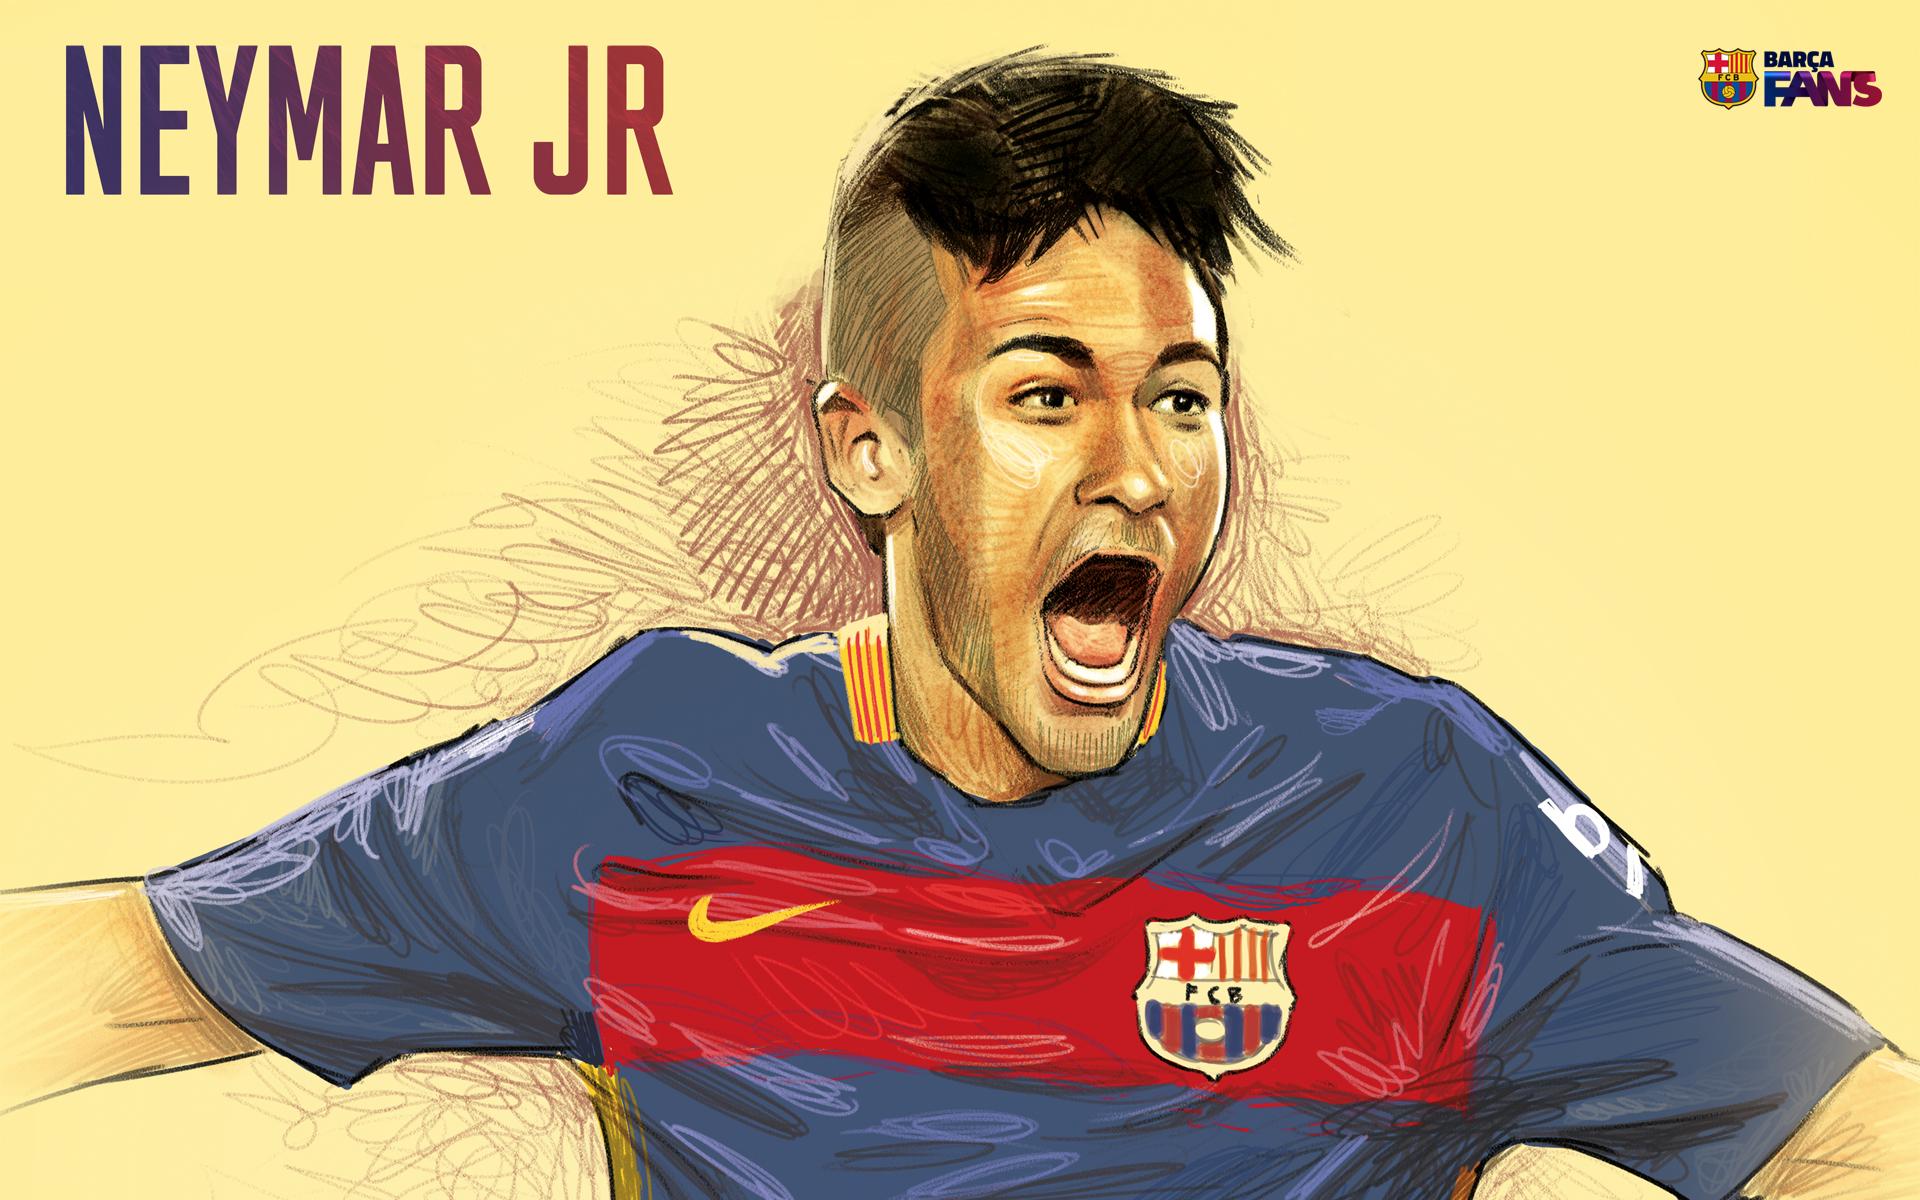 neymar jr wallpaper 2014